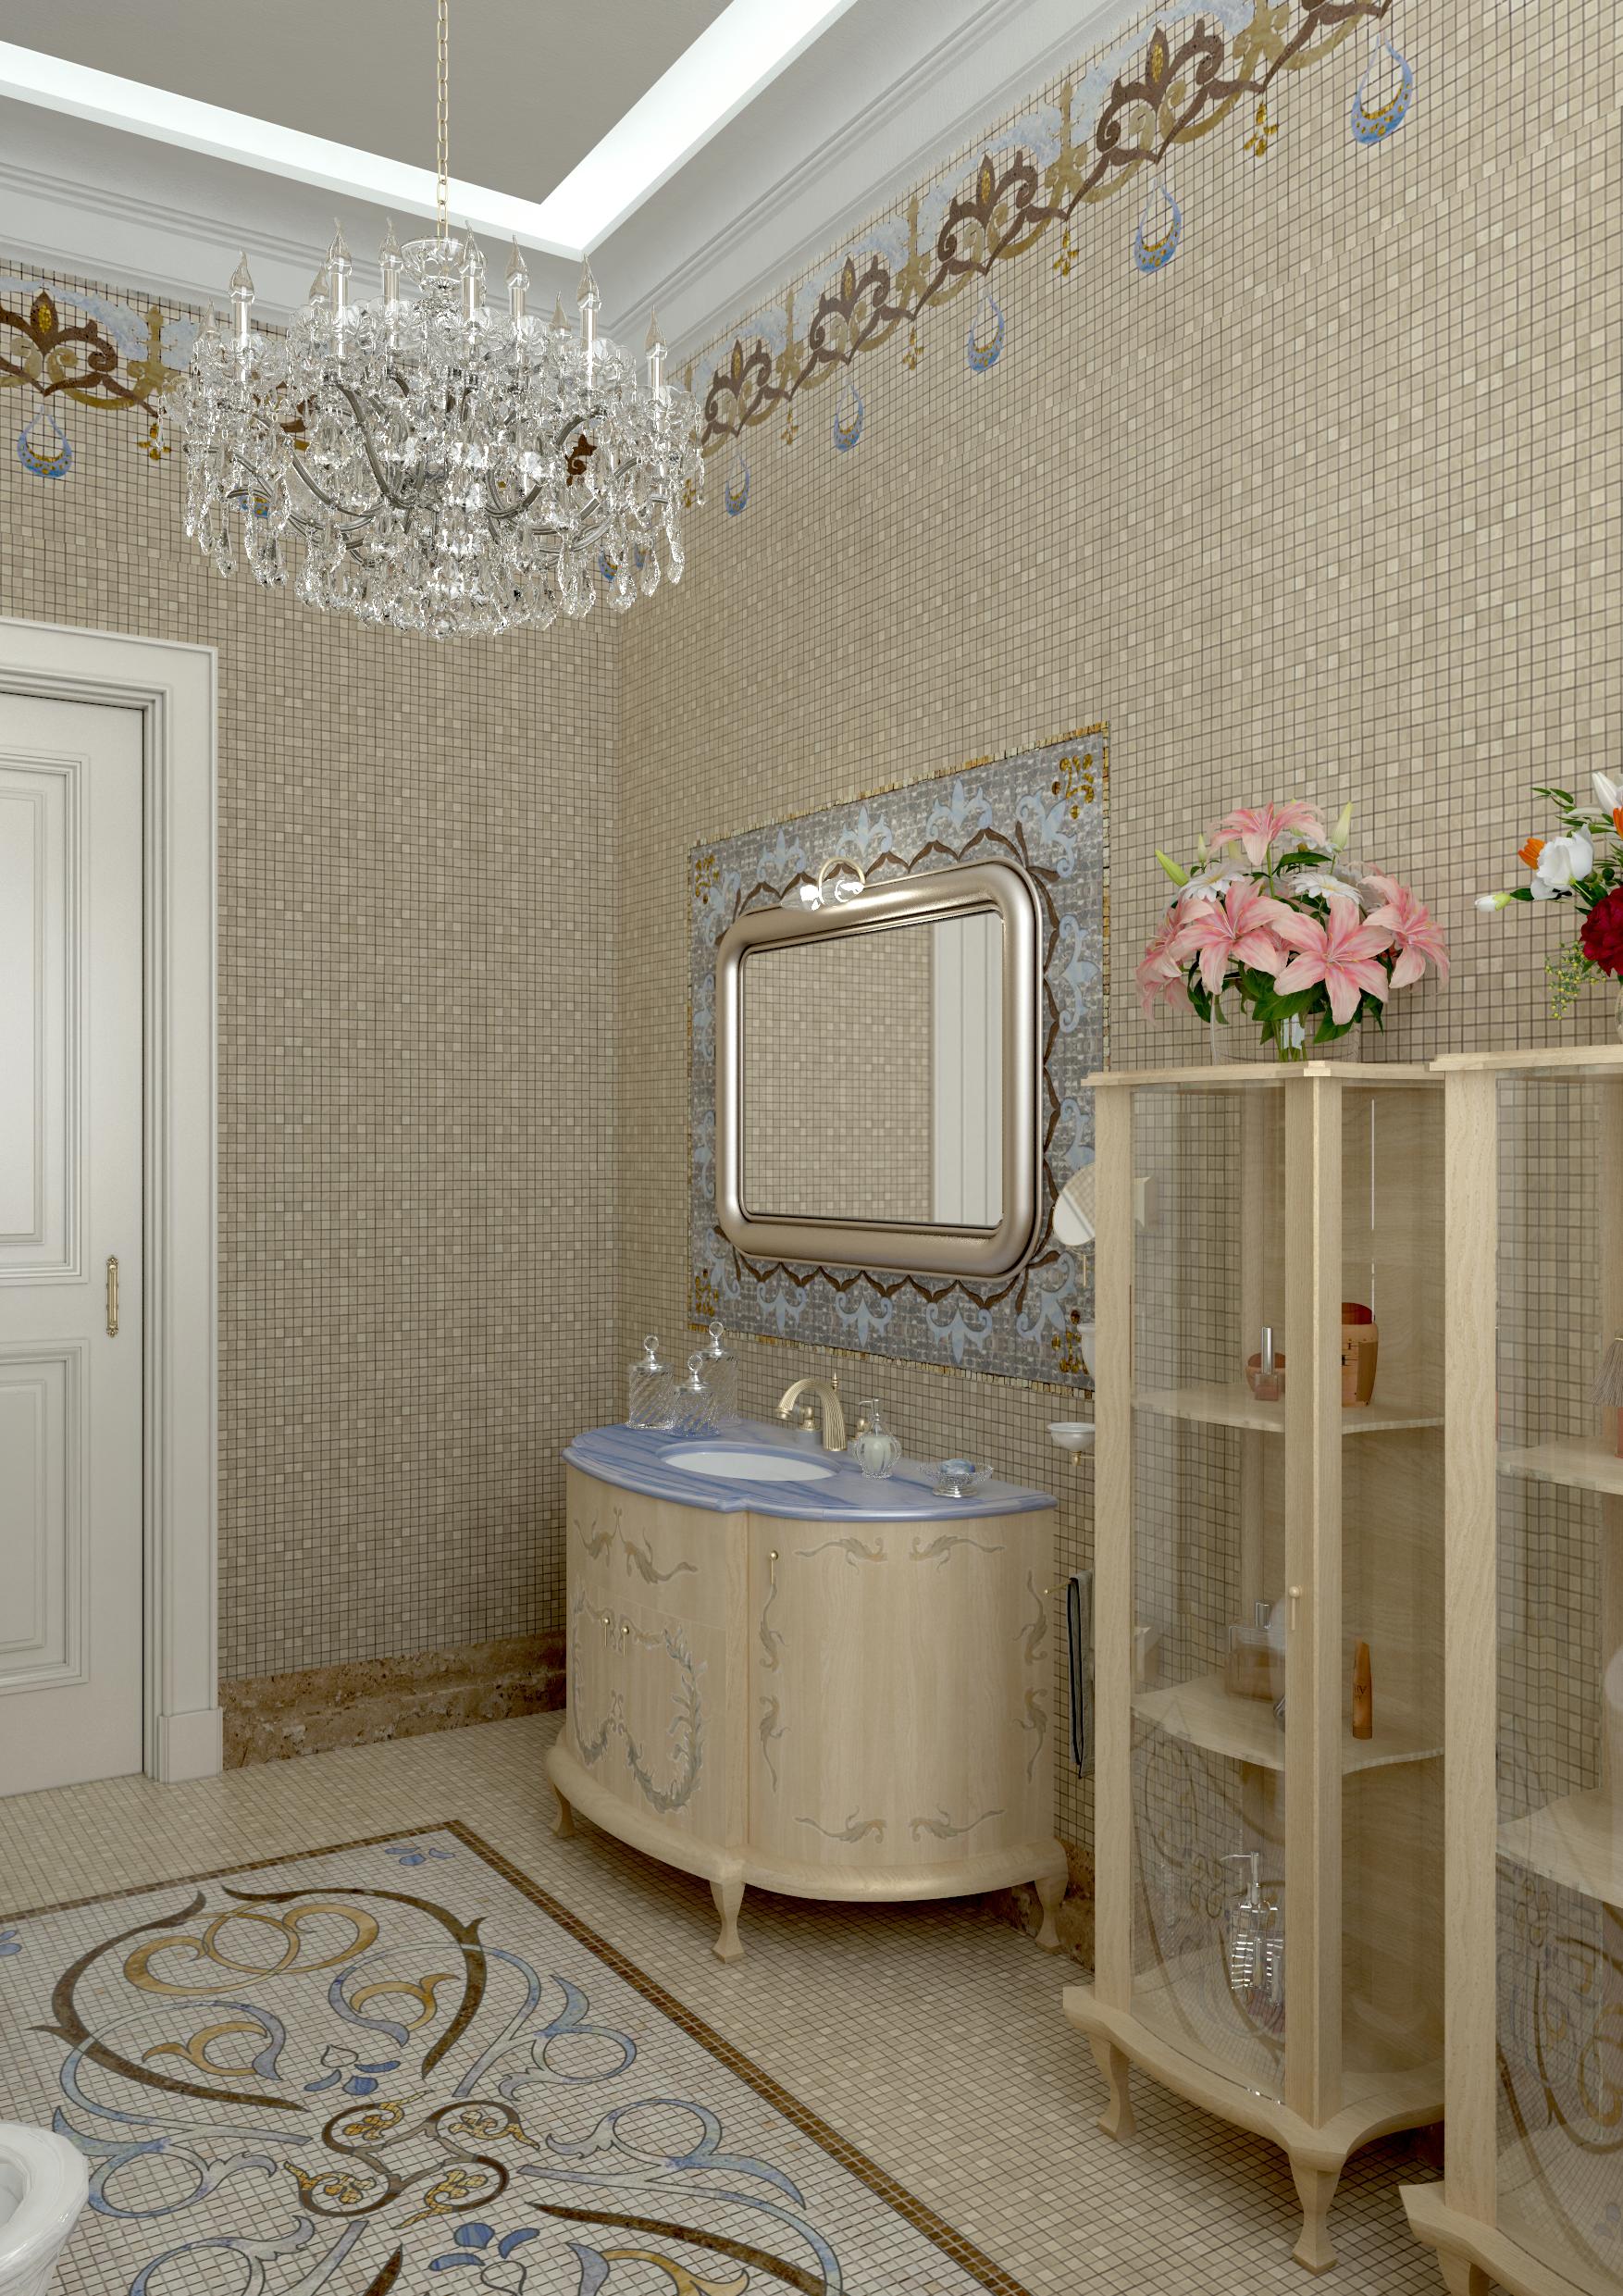 Bathroom T 09 Img002 Mosaico #Bathroom #Massimotrezziforniture Project By Massimo Trezzi Forniture